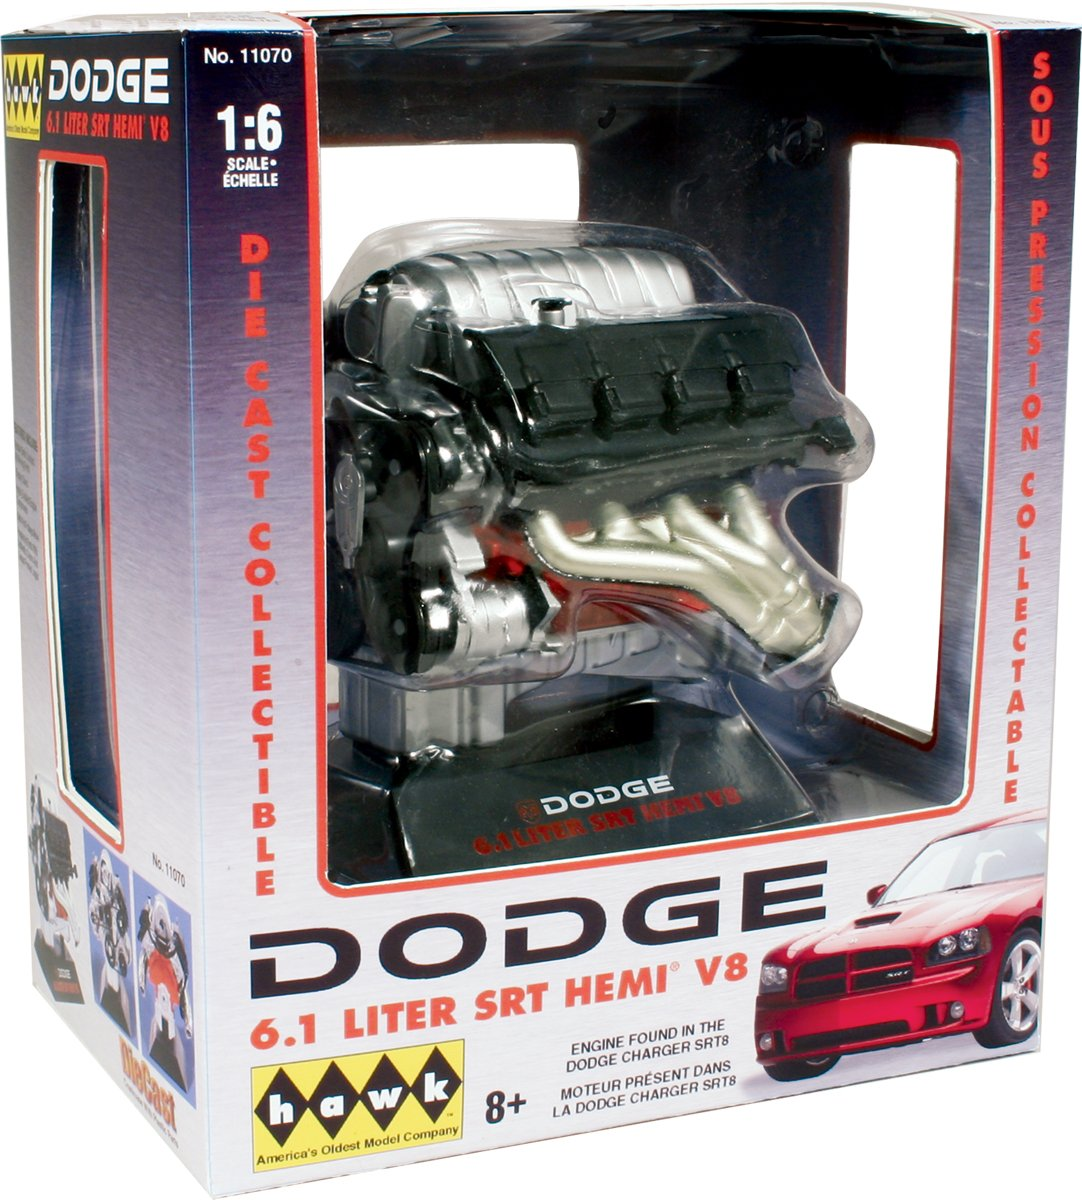 el precio más bajo Hawk 11070. Motor Dodge 6.1 SRT Hemi Hemi Hemi V8. Escala 1/6  a la venta